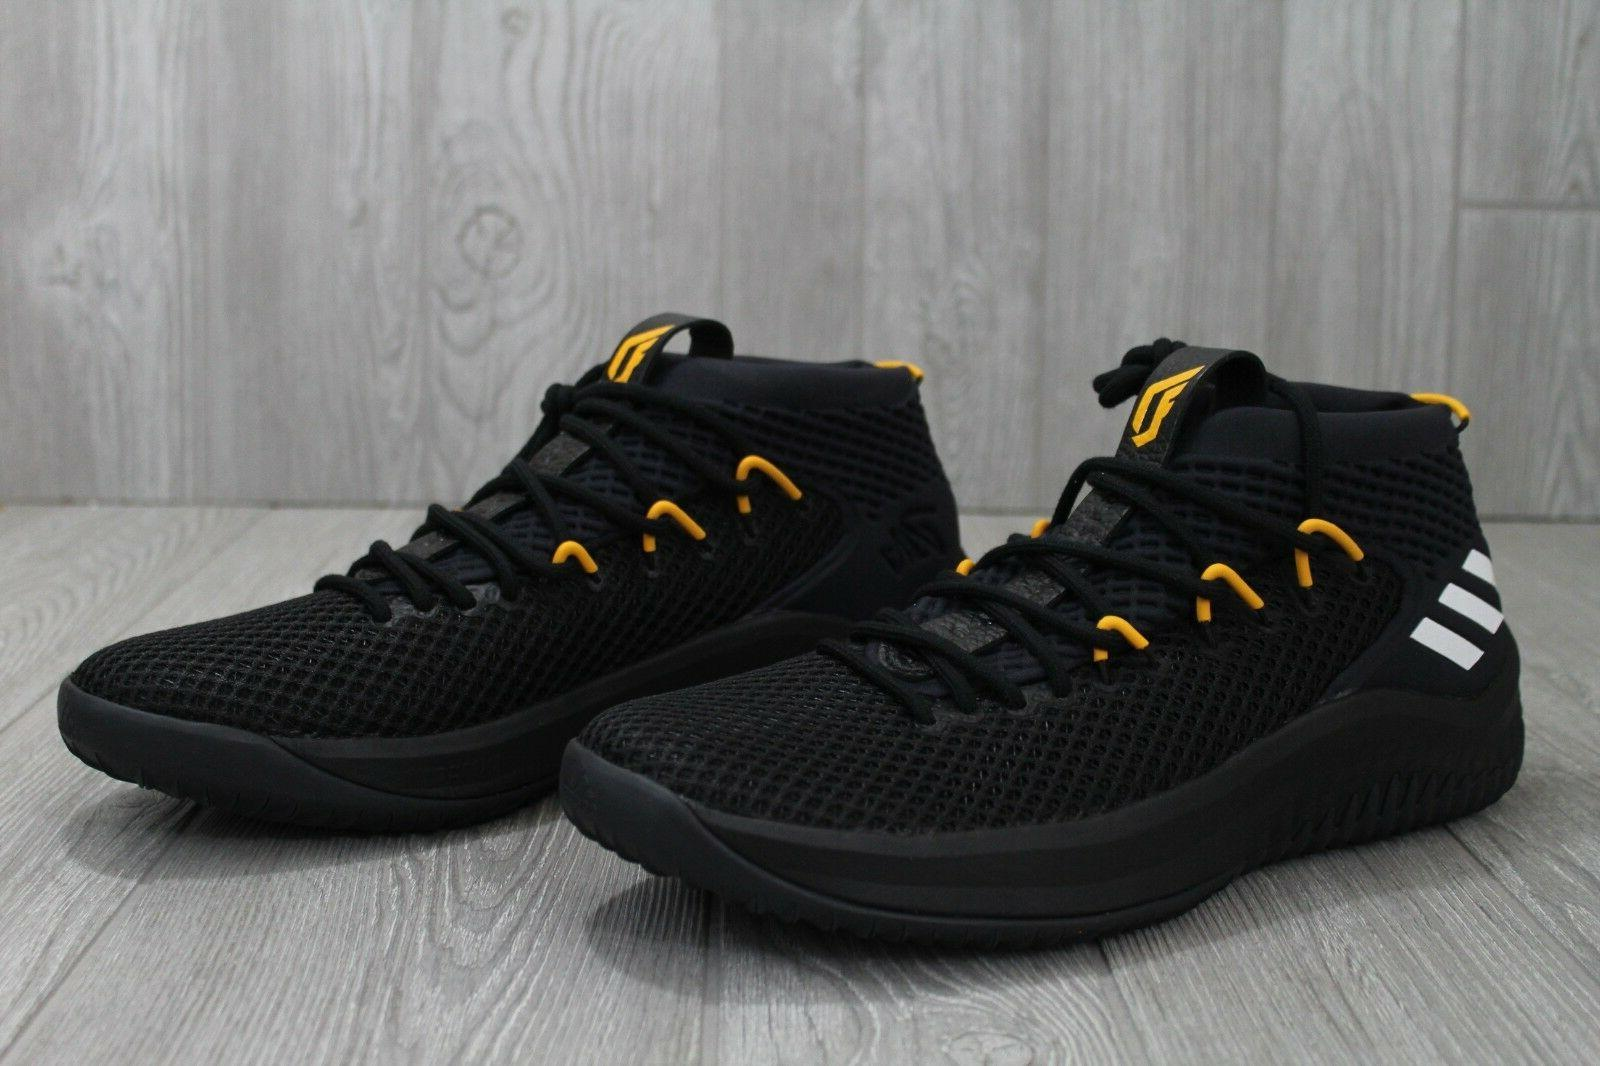 32 Adidas 4 Black Yellow Lakers PE Basketball Shoes 12.5 13